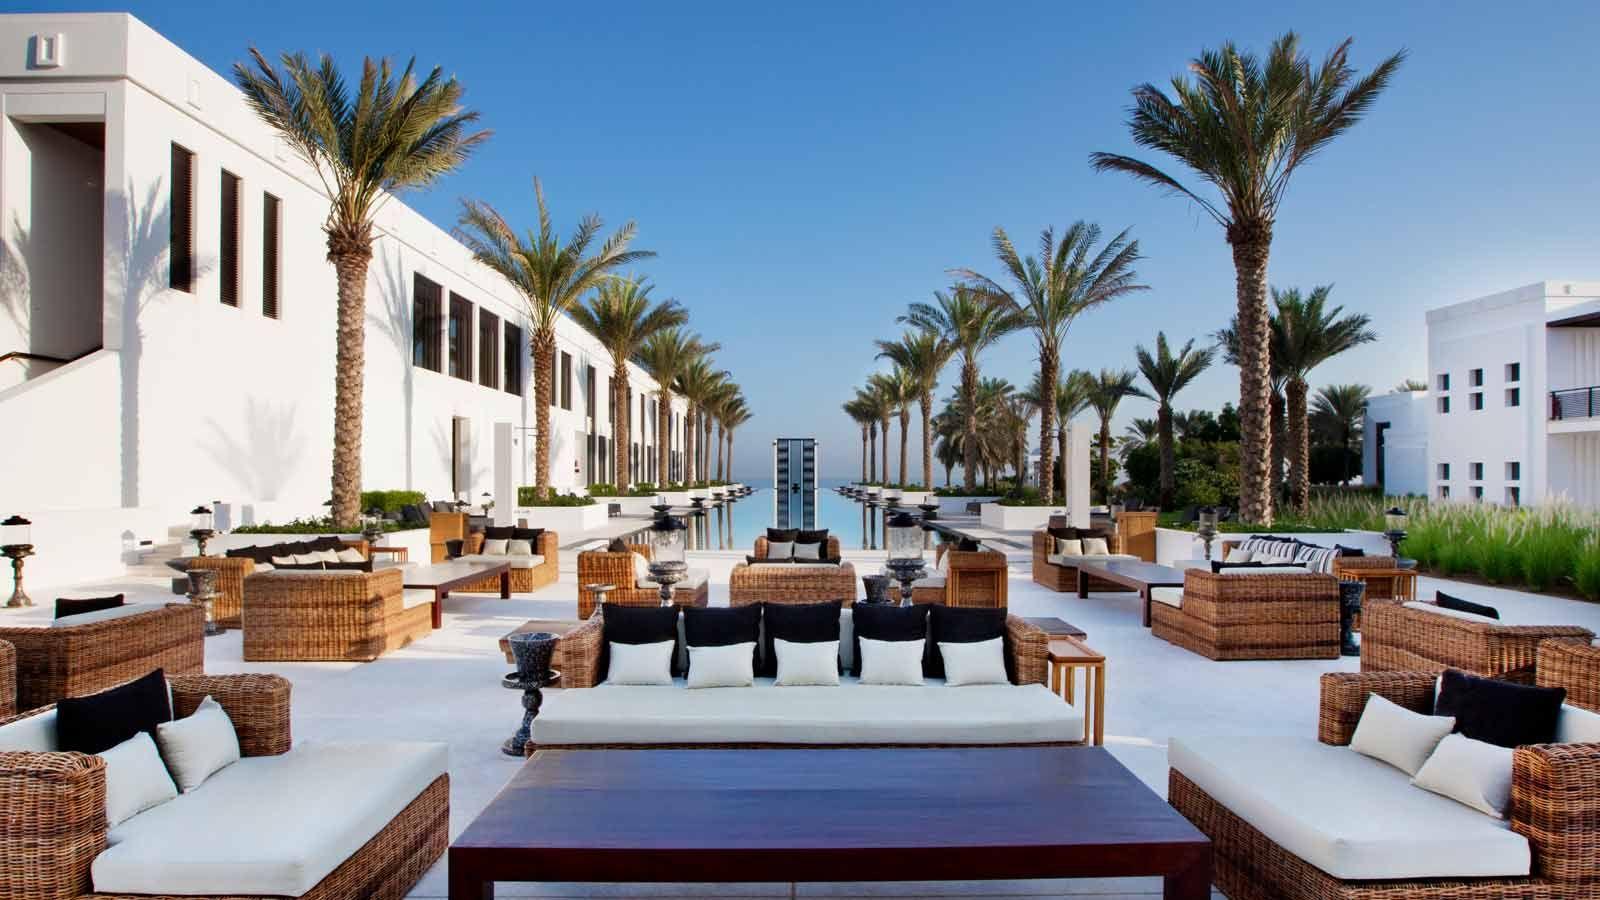 The Chedi Mu Luxury Hotel Oman 5 Star Boutique Ghm Hotels